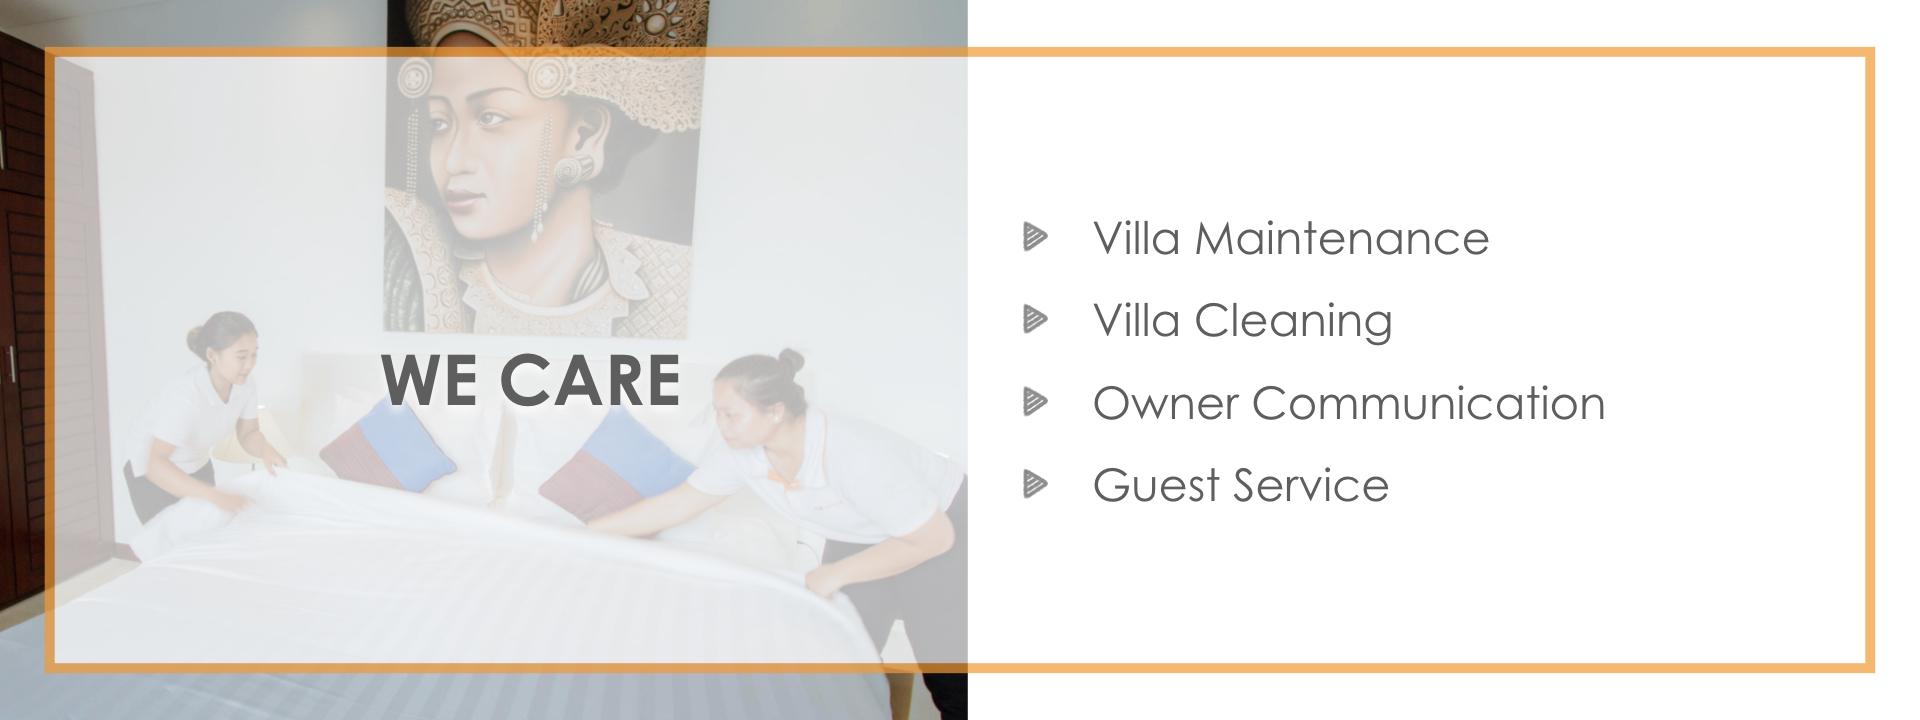 Bali Management Villa and Property Maintanance.jpg